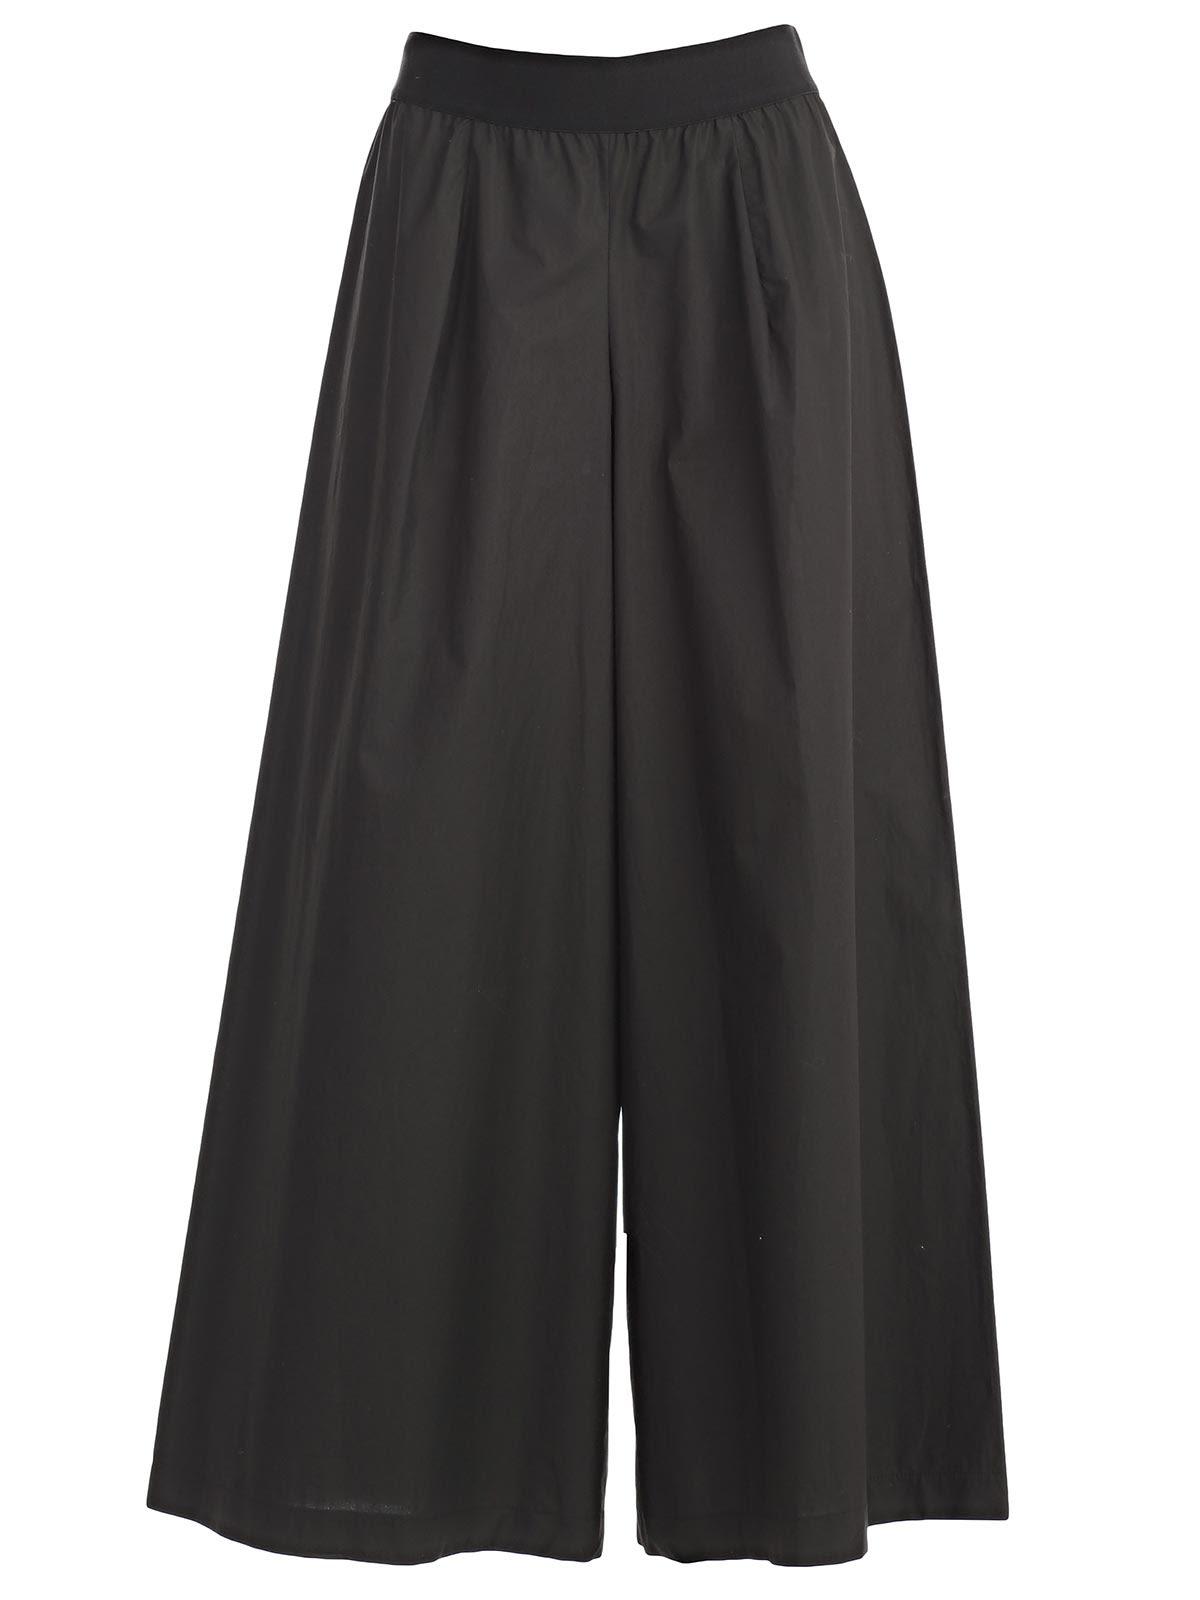 Pantalone Largo Elastico Vita